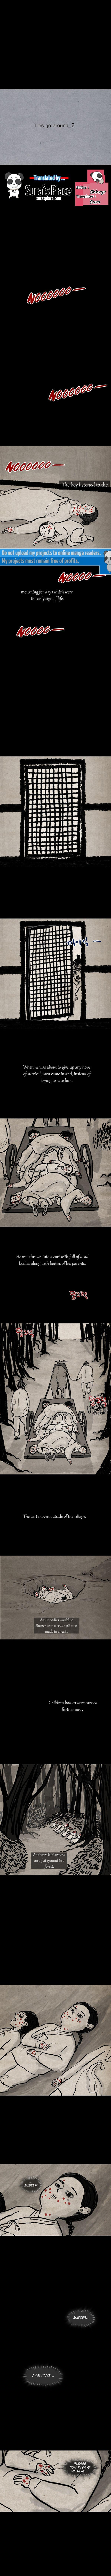 The Chronicle of Myo-Jin 19 Page 1